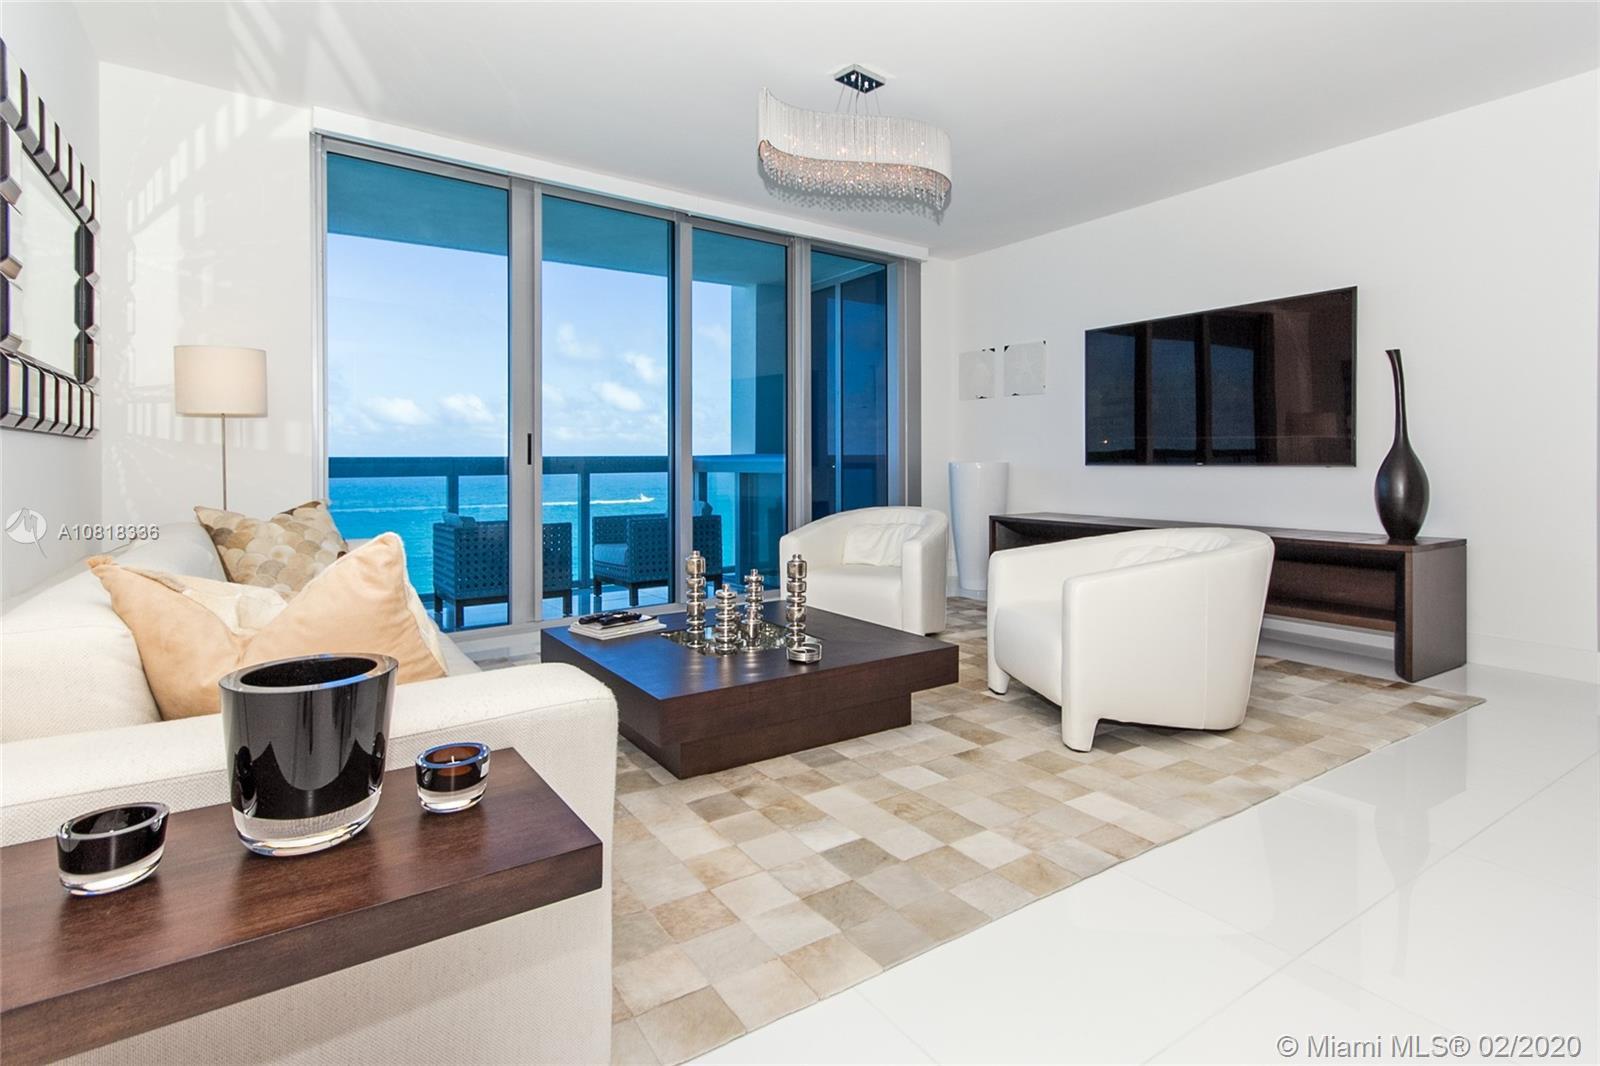 6899 Collins Ave, 2207 - Miami Beach, Florida